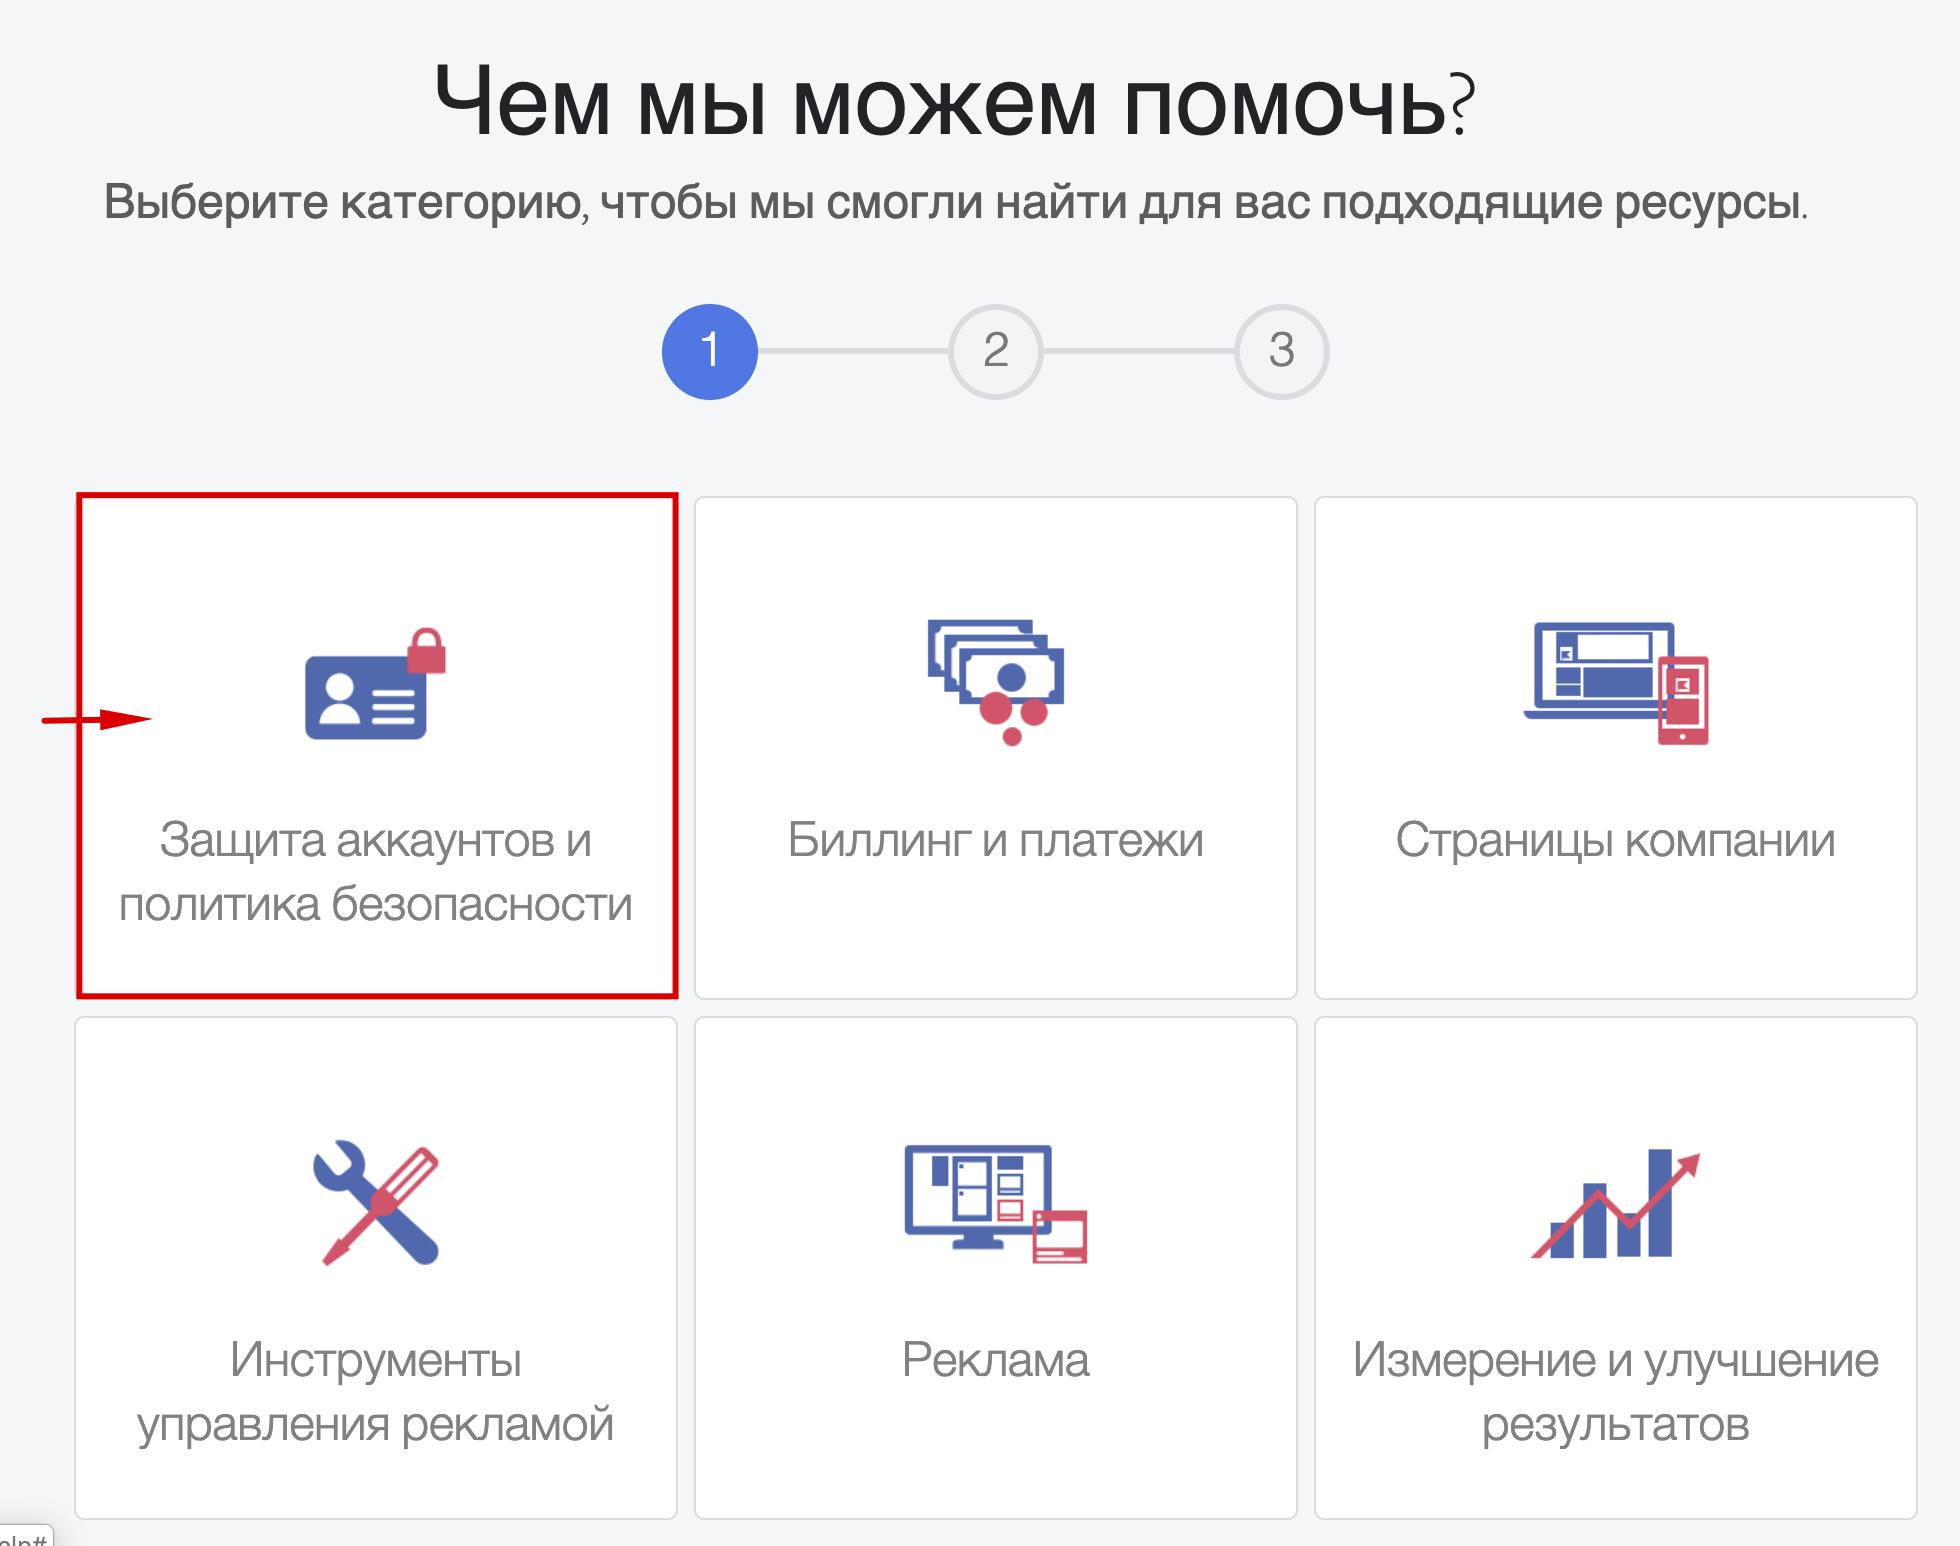 kak-razblokirovat-menedzher-reklamy-Facebook-2.png